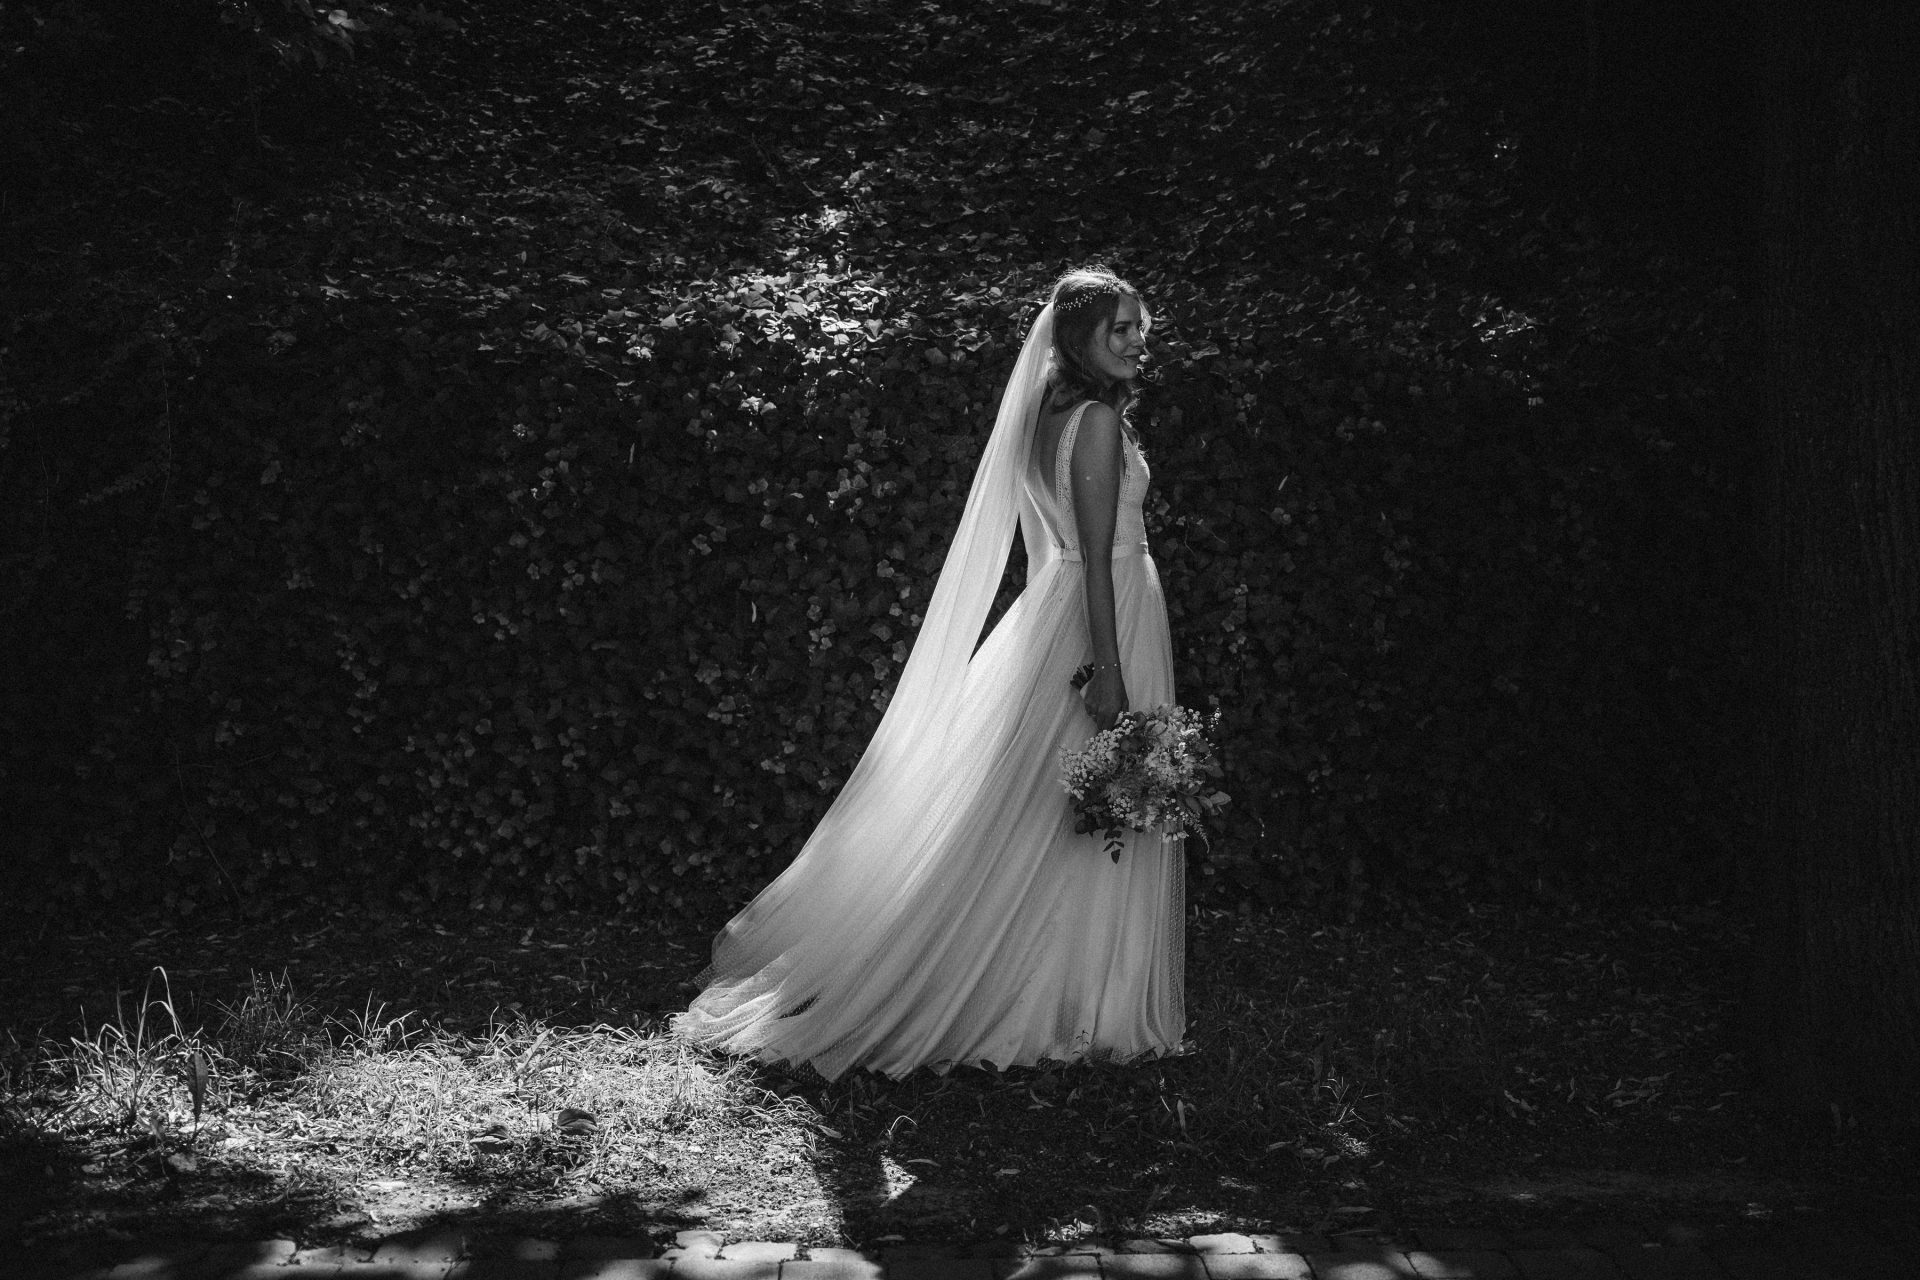 Hochzeit Weingut Kern Dominika Elasbraut Tinaundmaxim12